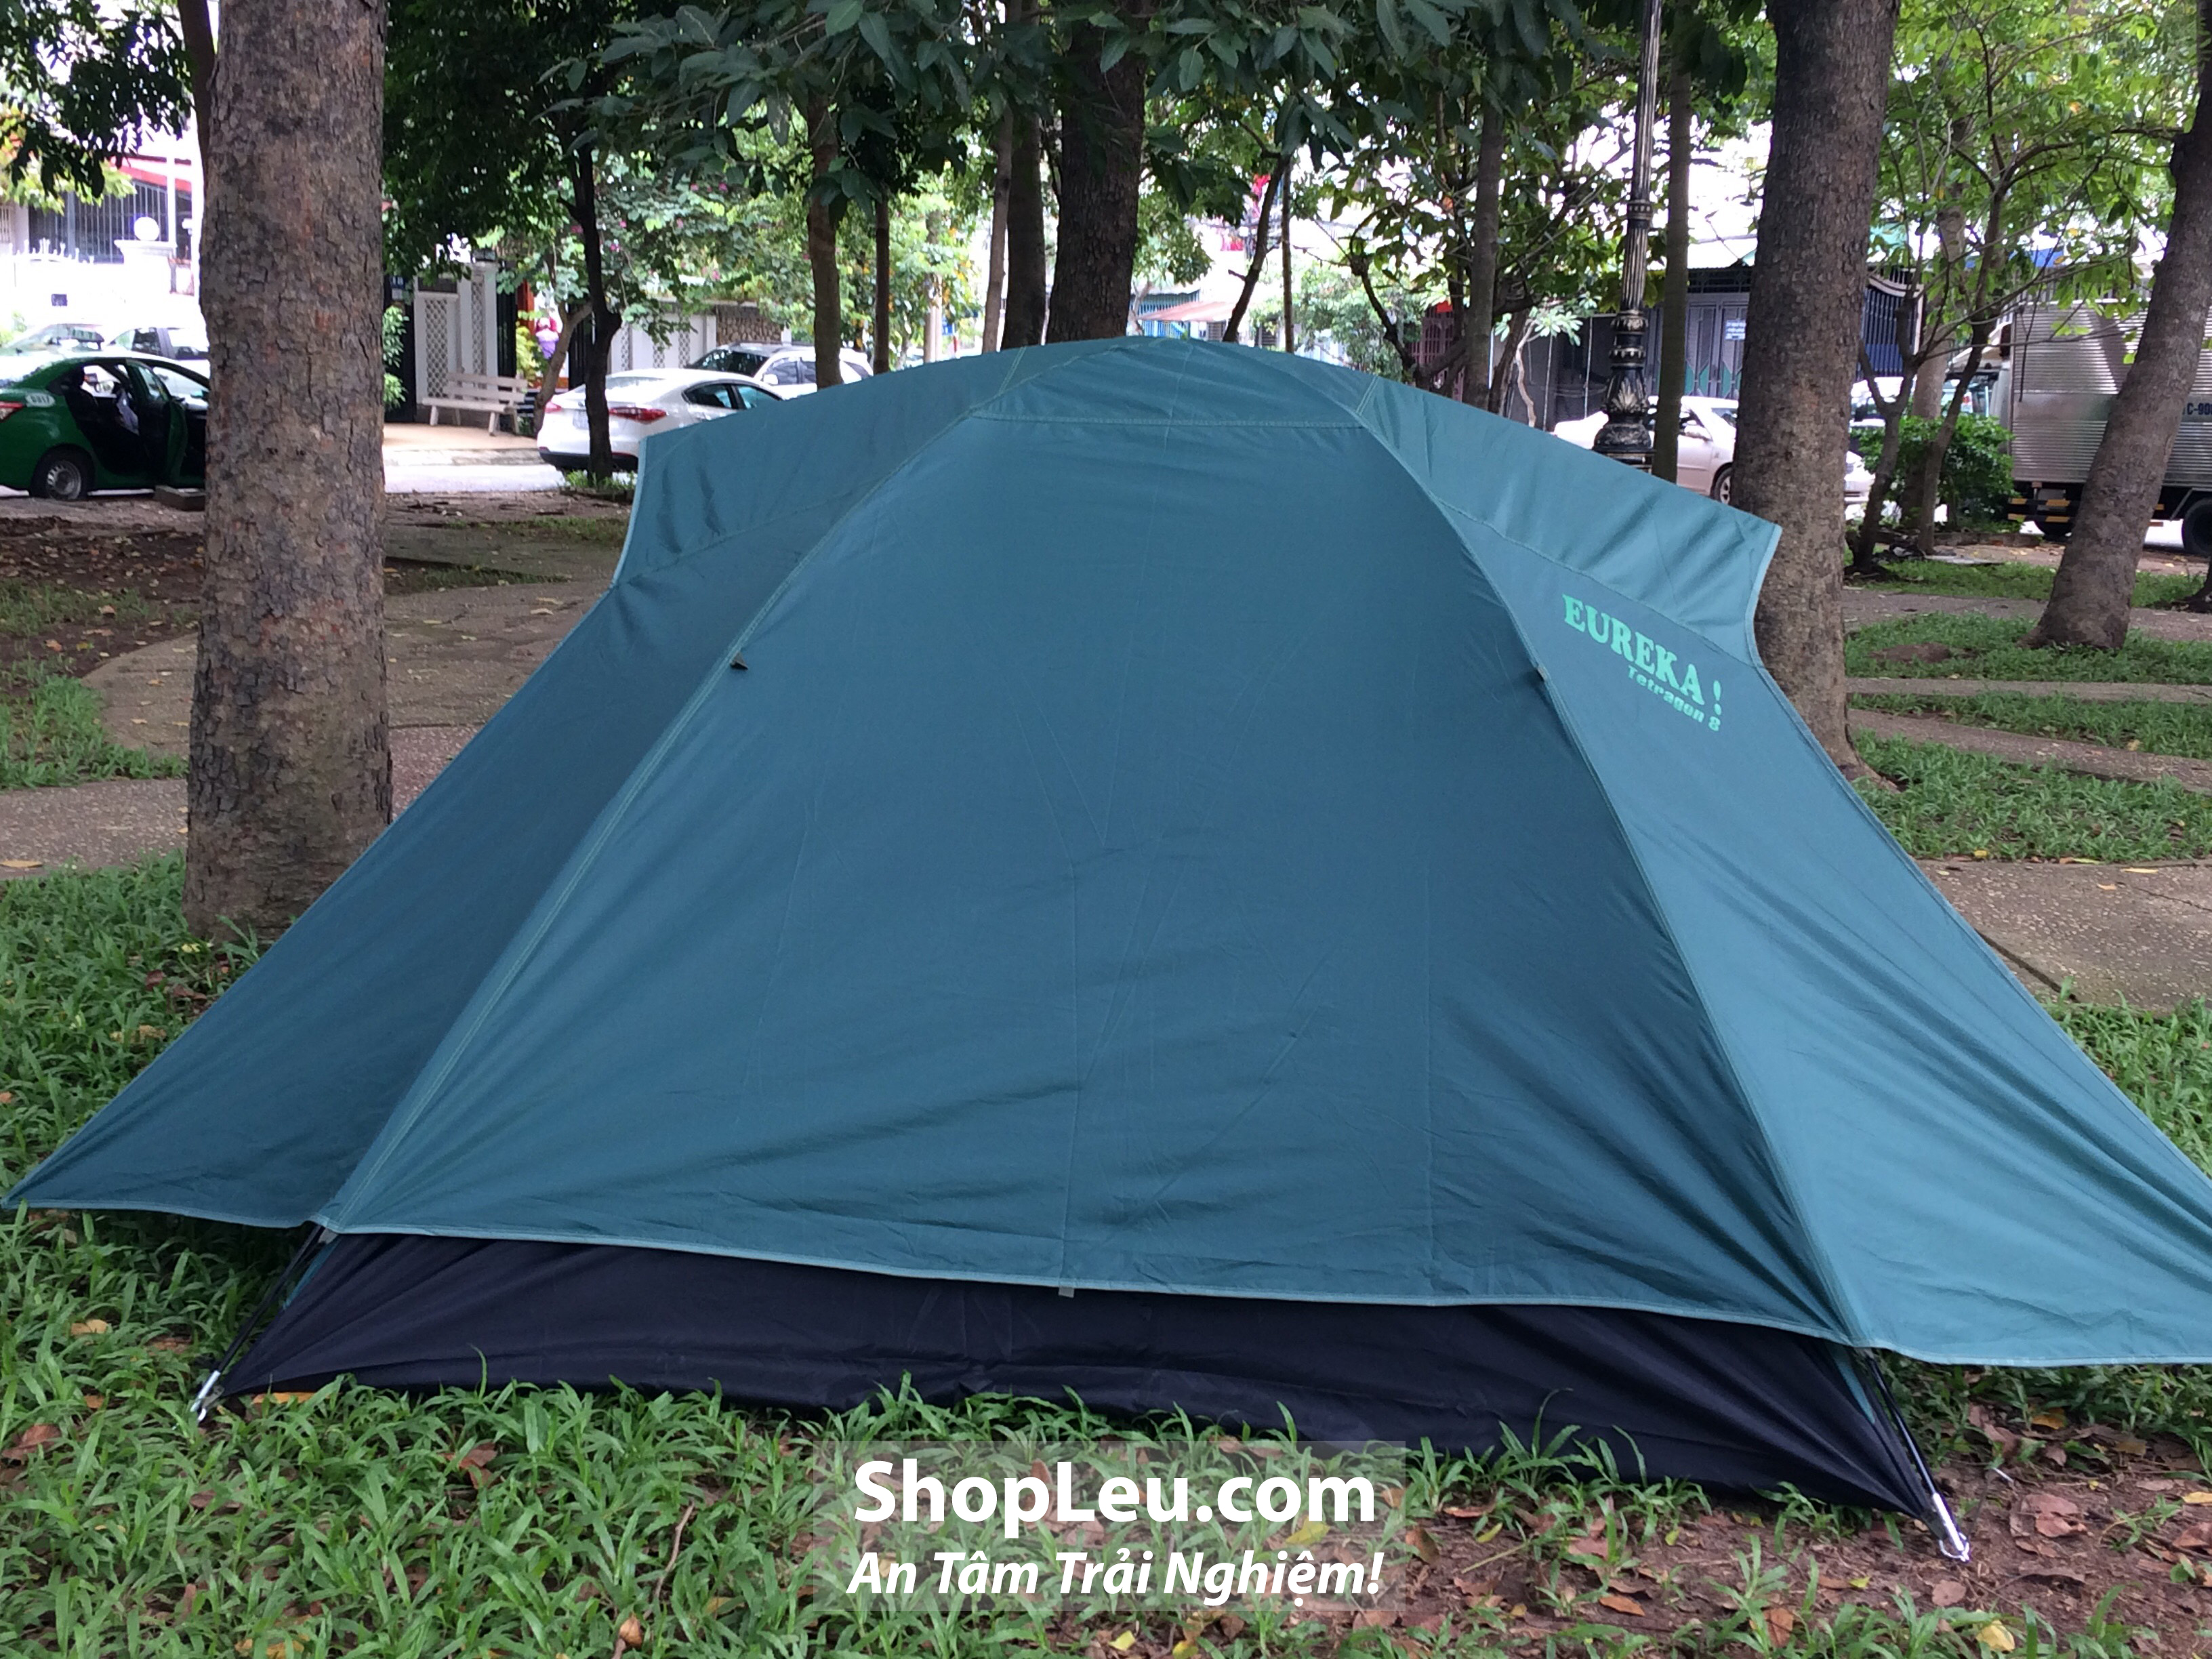 lều cắm trại 6 người eureka tetragon8 hai cửa